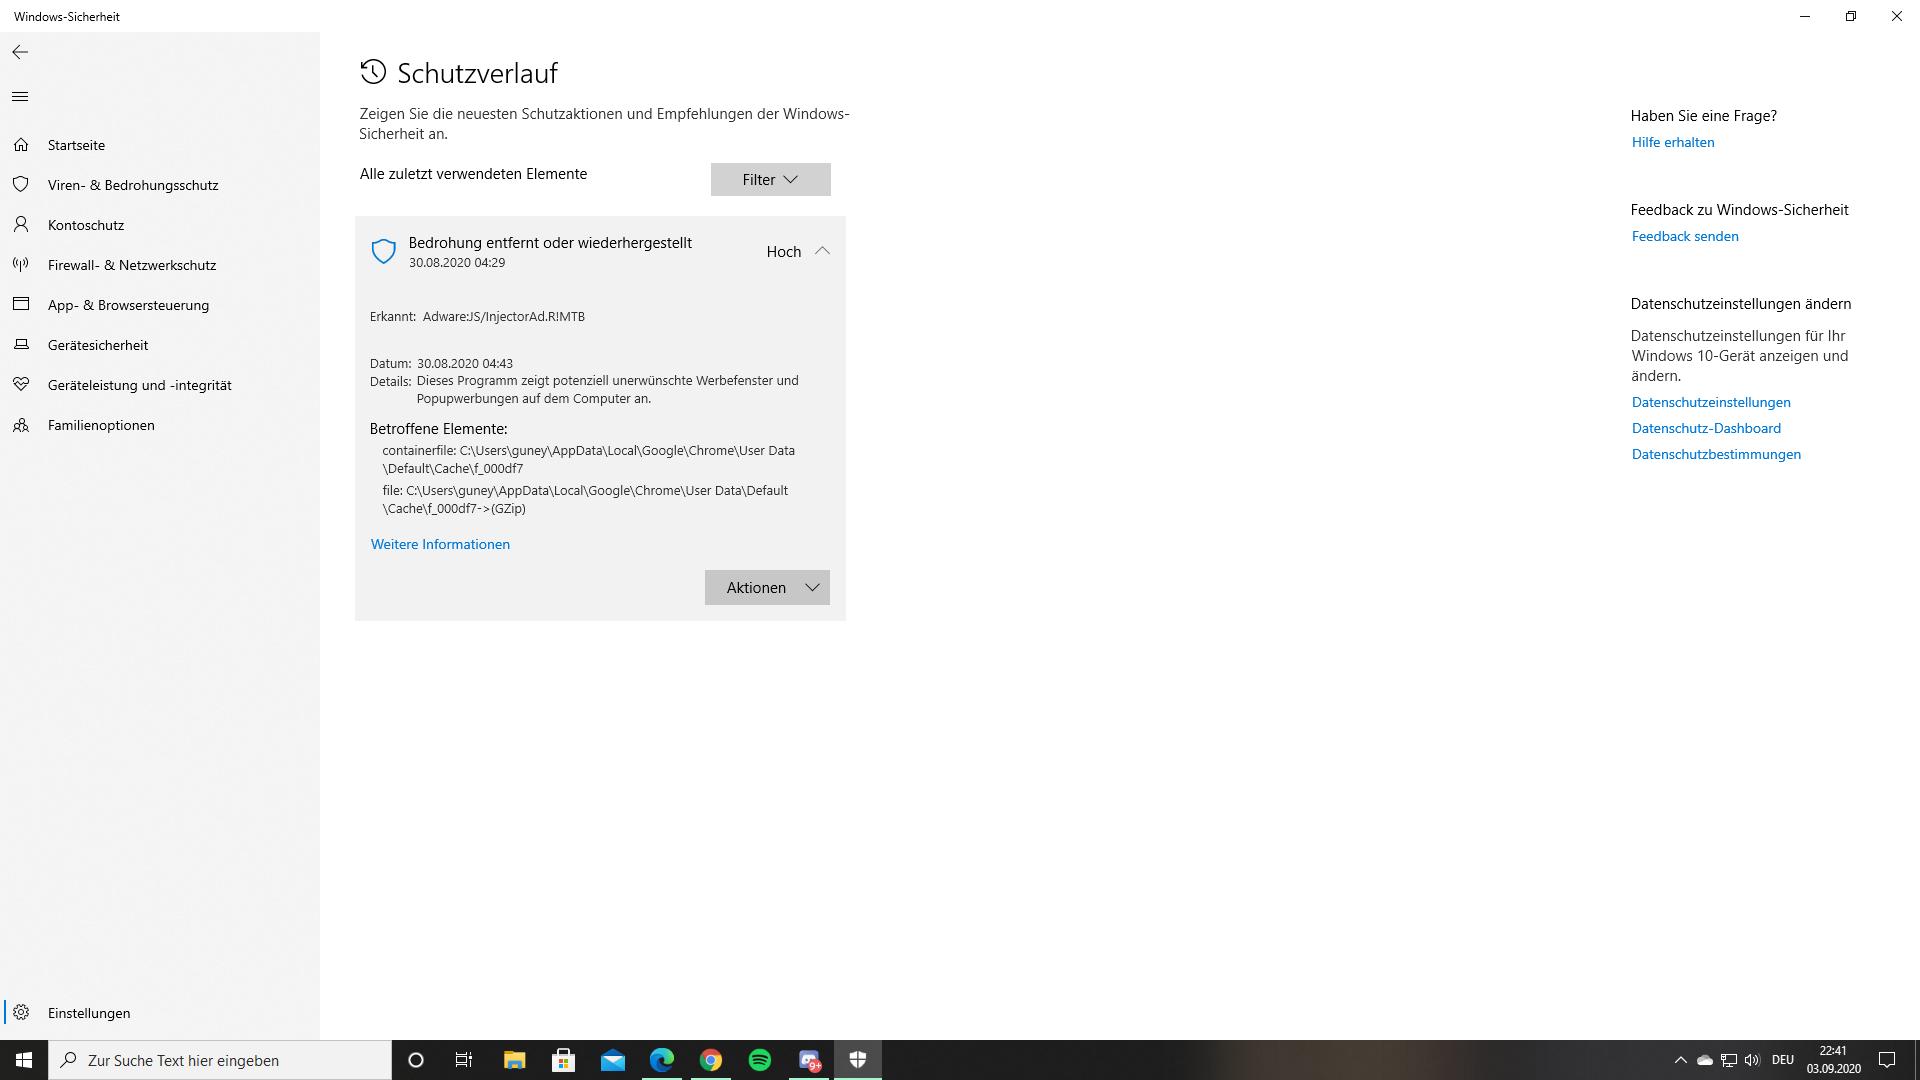 Bedrohung noch auf dem PC ?